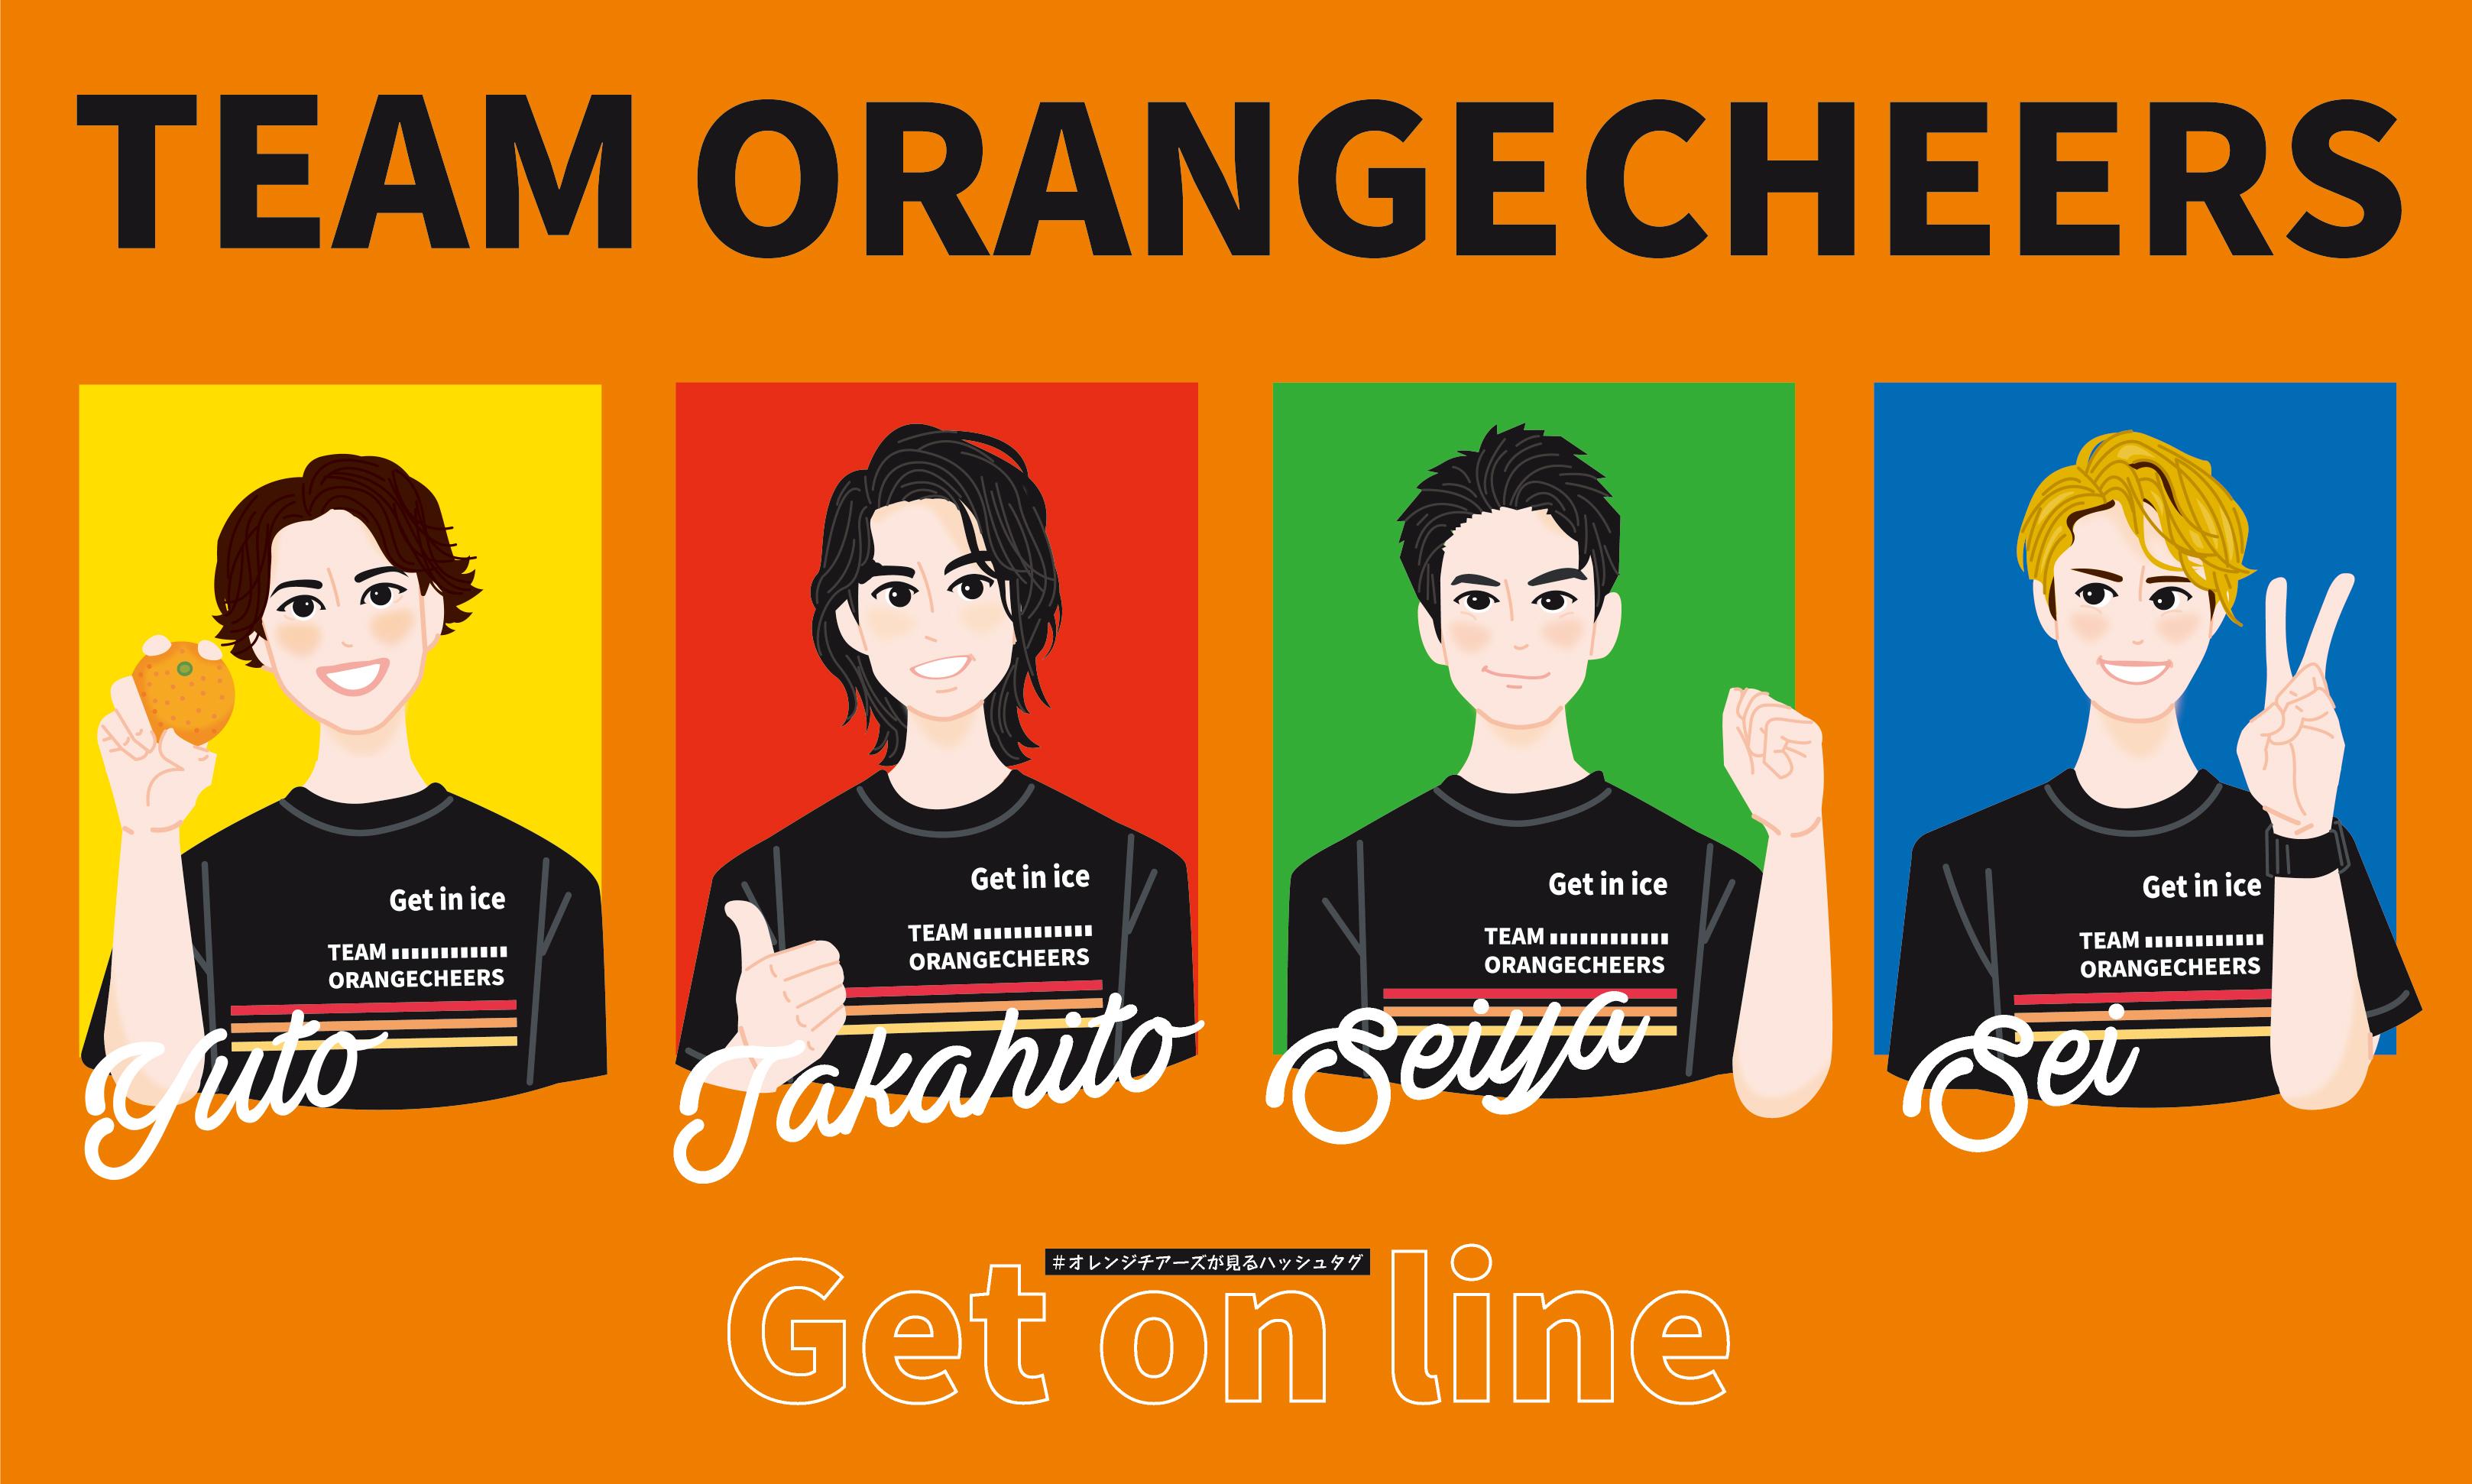 Team Orange cheers